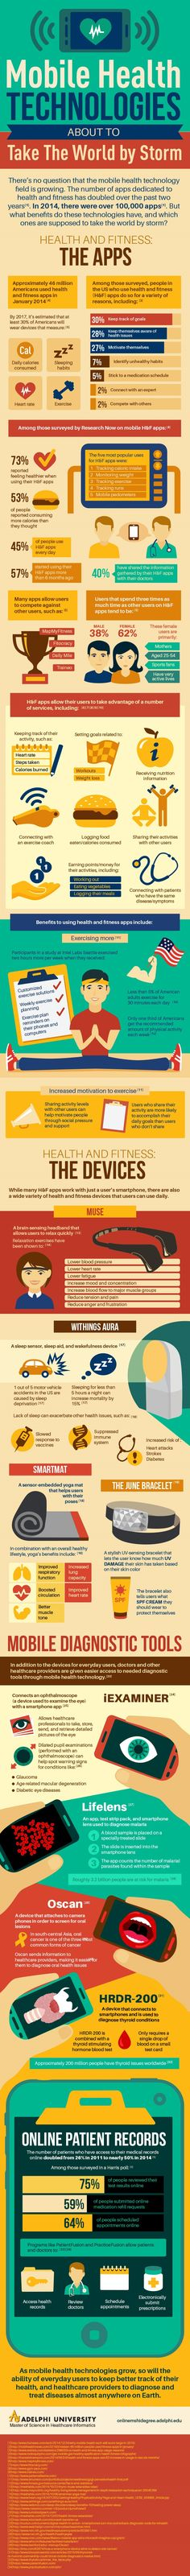 MobileHealthapps_infographic_Adelphi